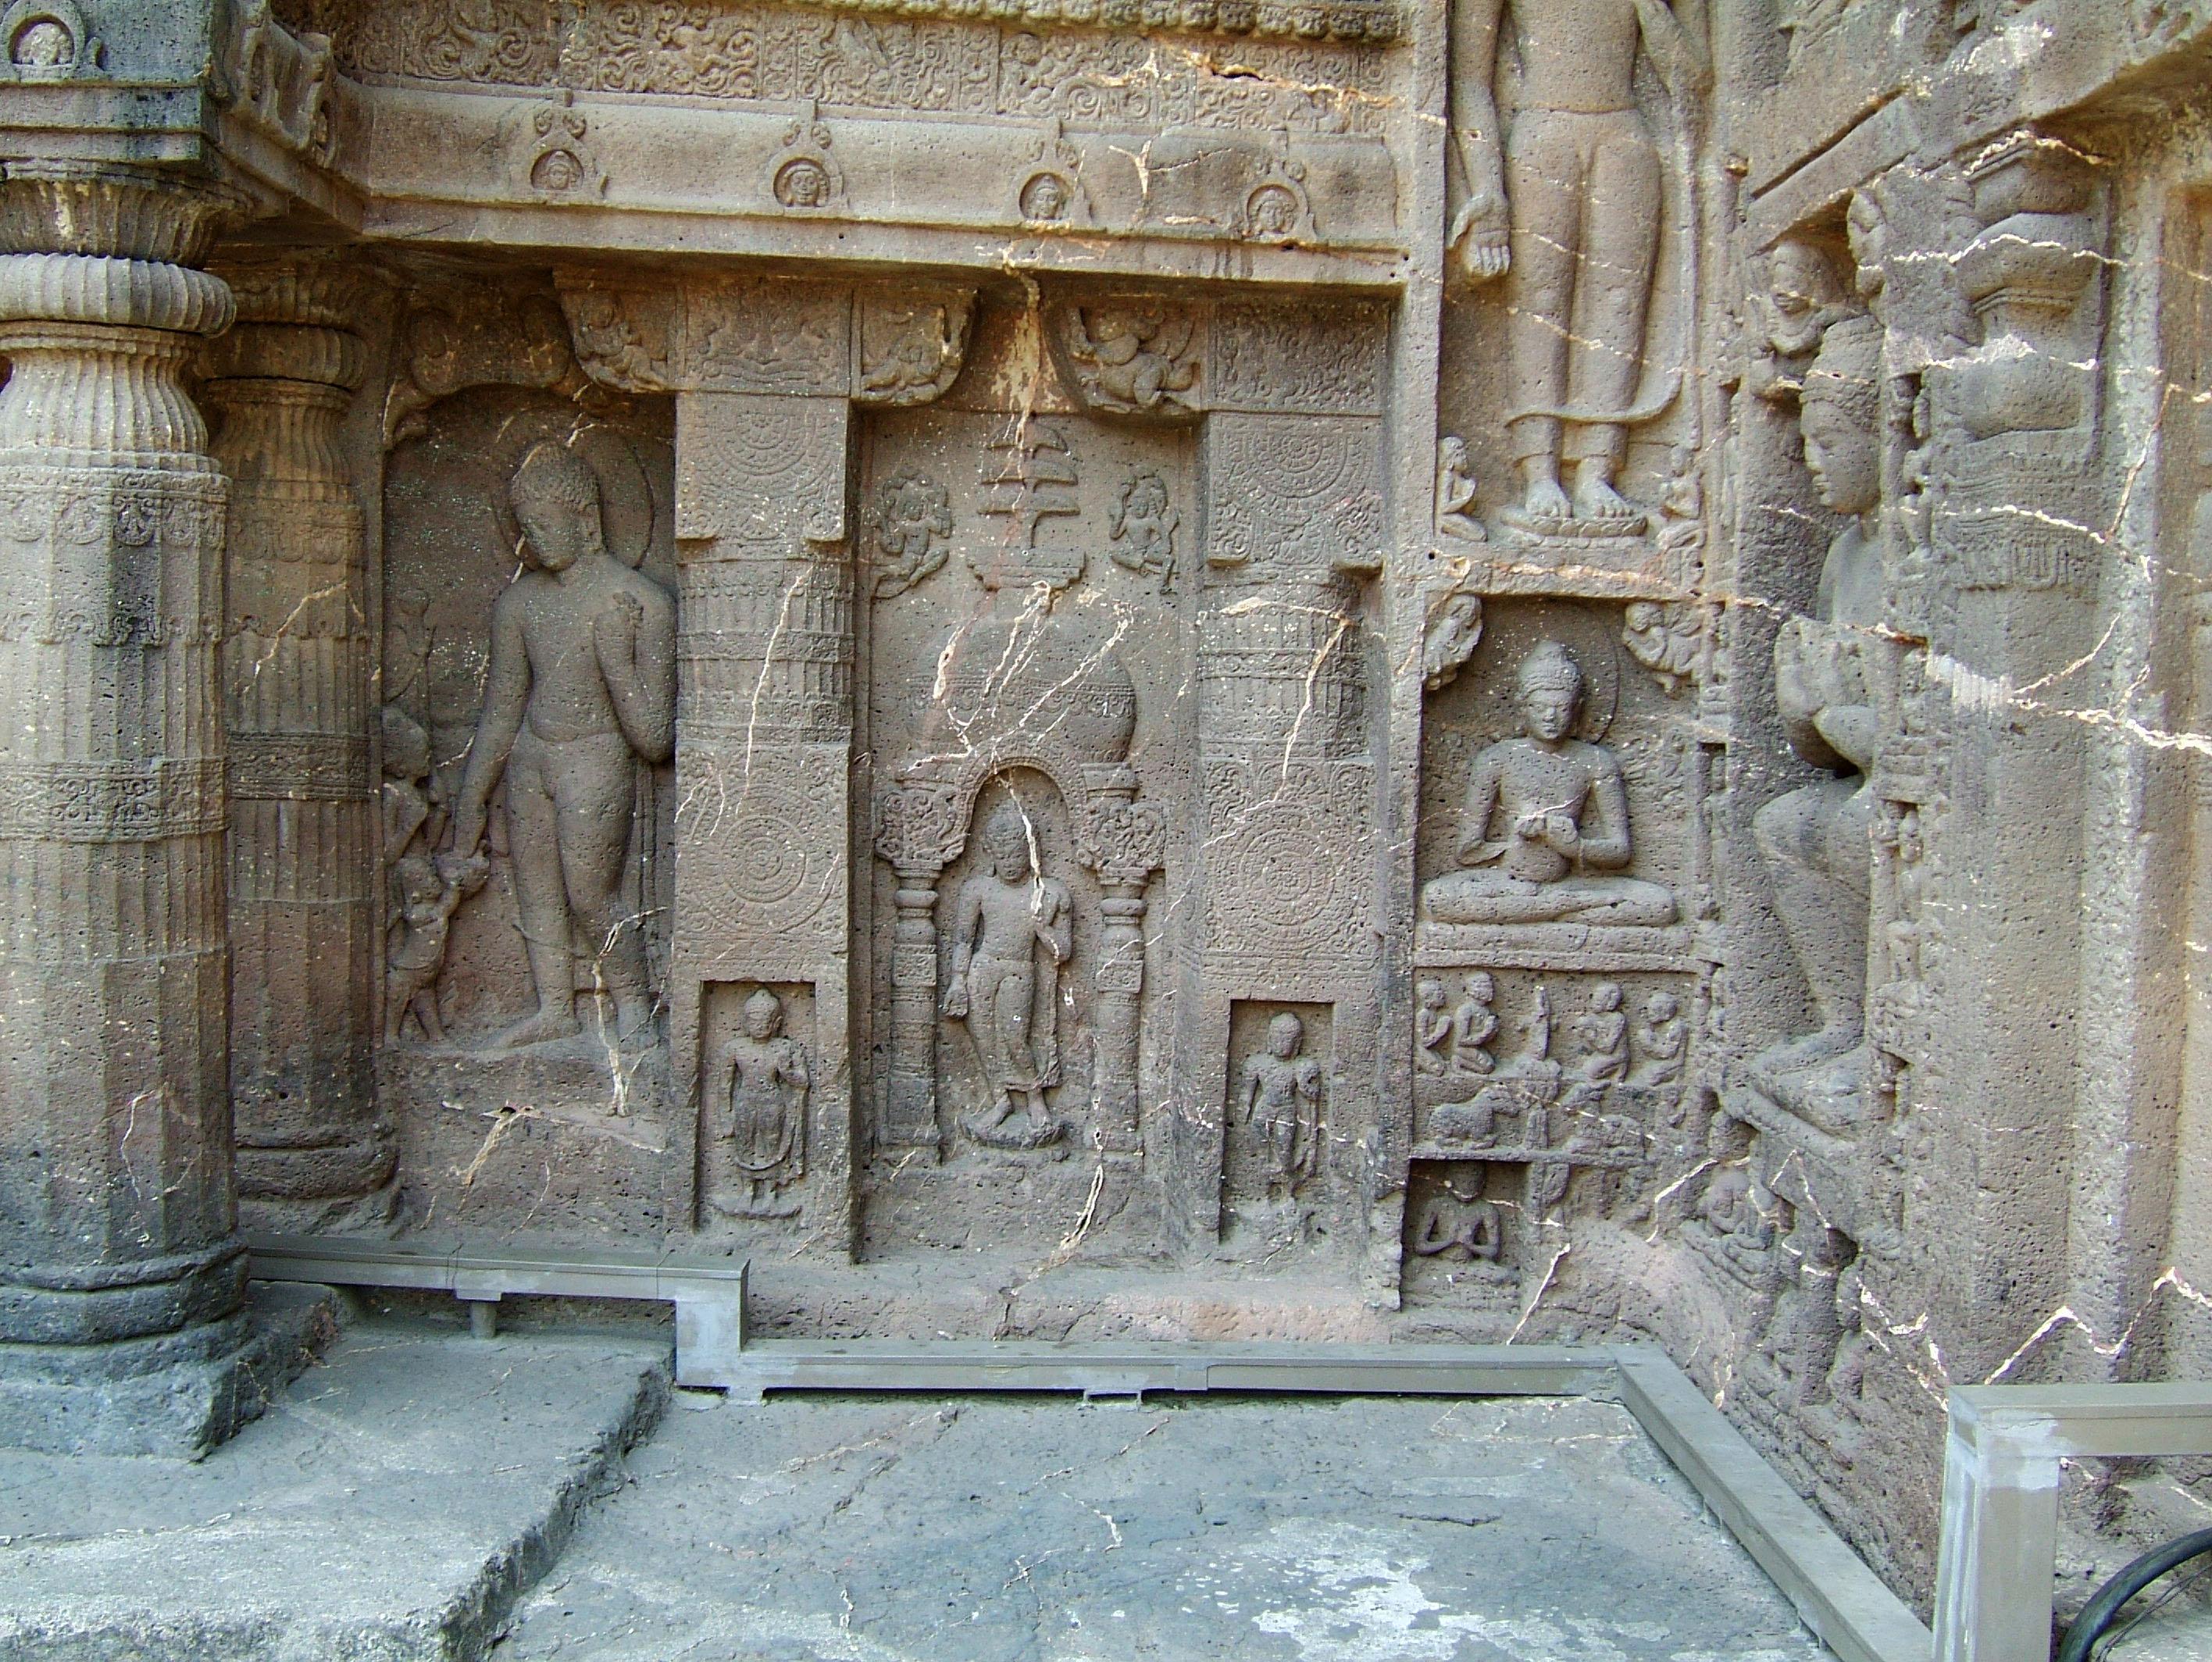 Marathwada Ajanta Caves Buddha carvings India Apr 2004 09